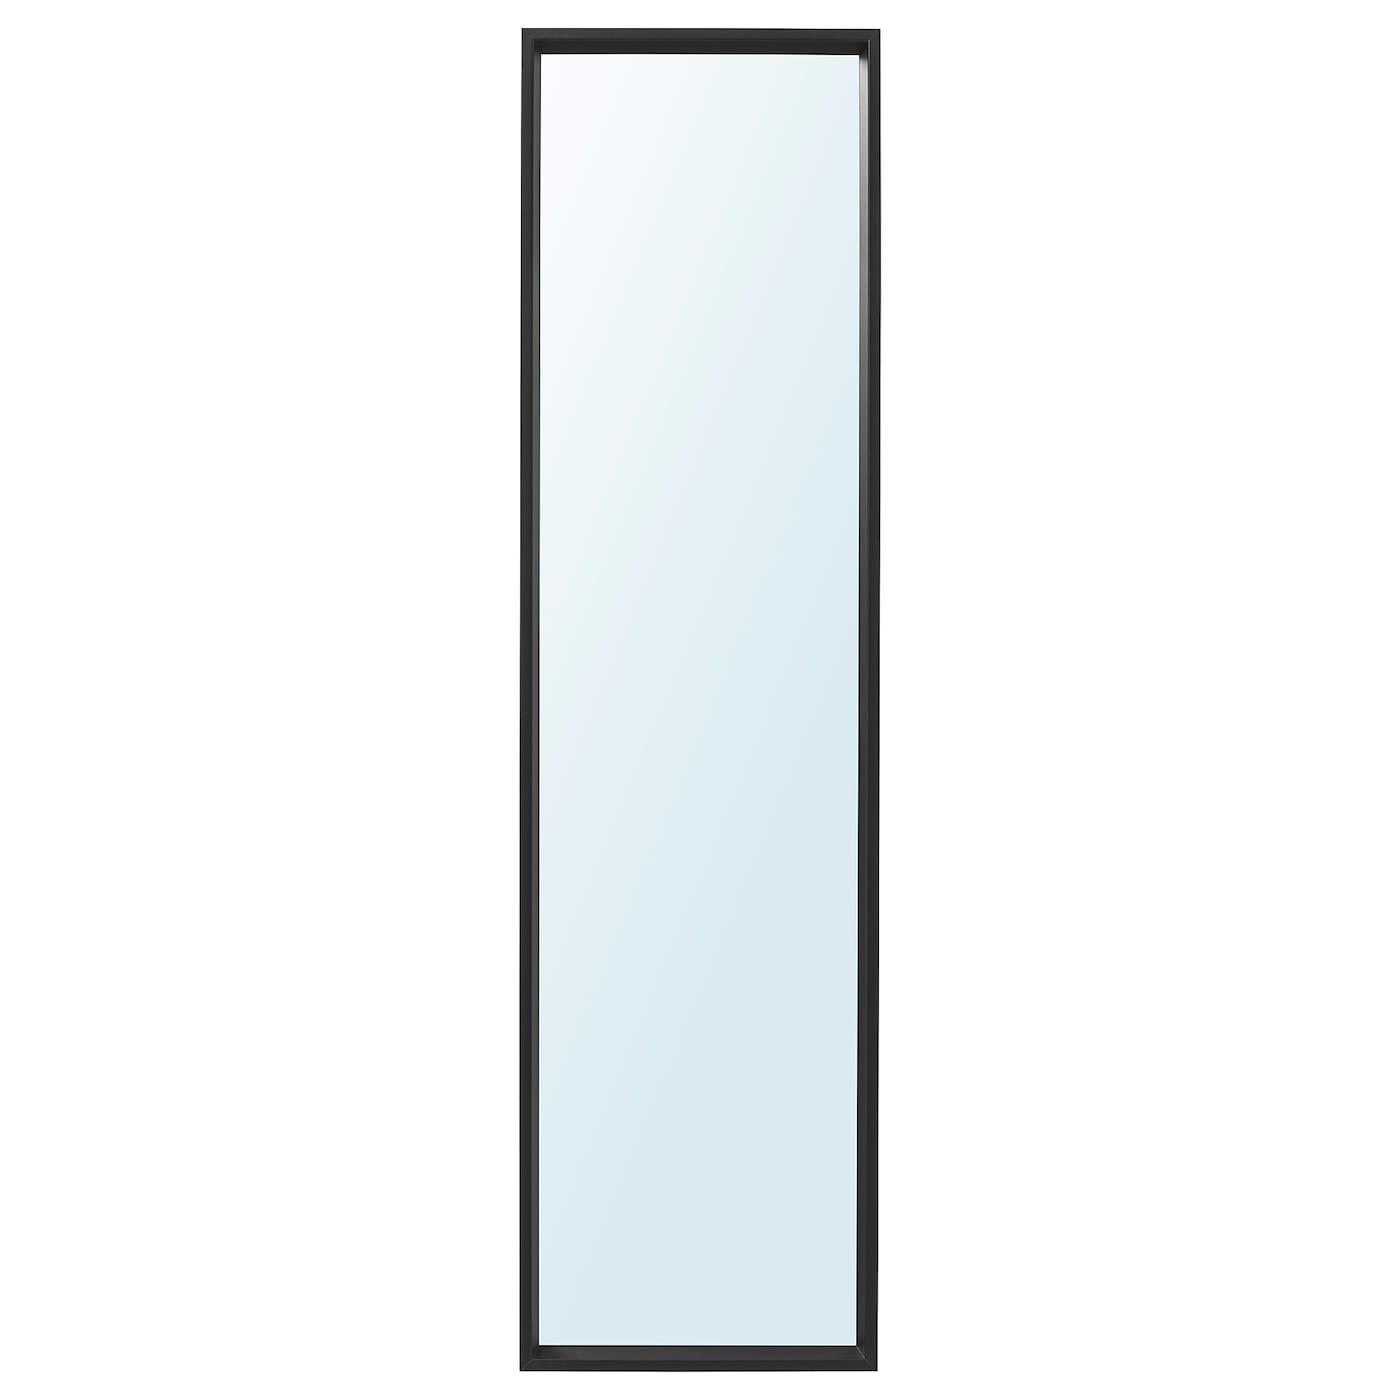 Nissedal Spejl Sort 40x150 Cm Ikea